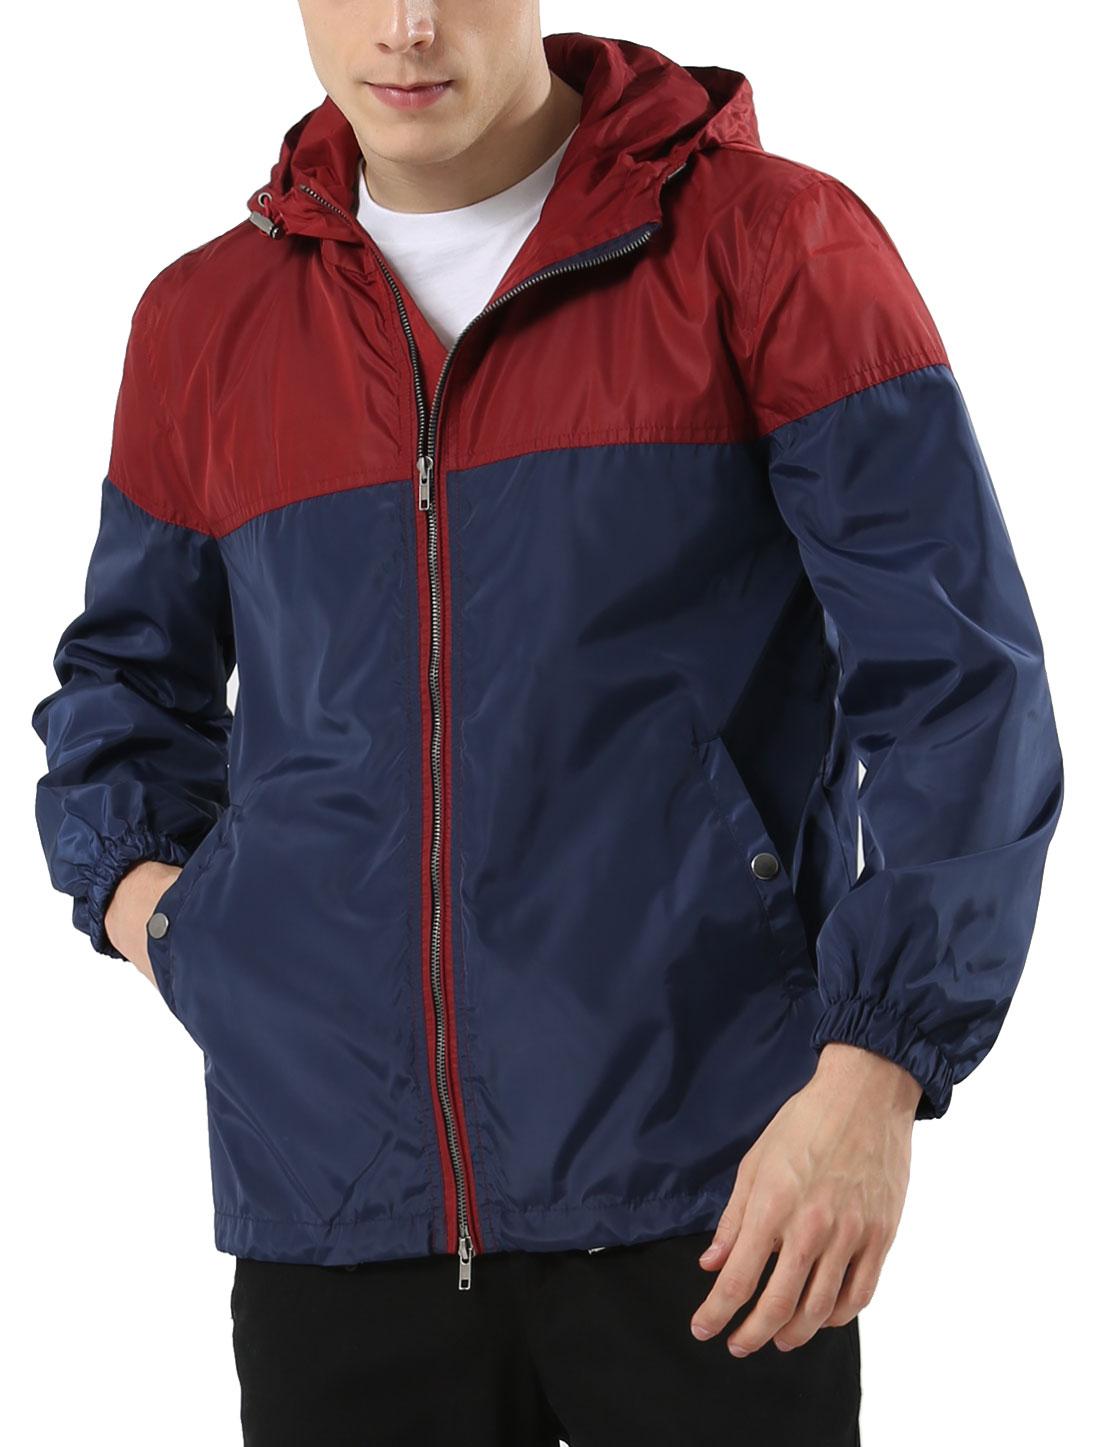 Men Zipper Front Color Block Checks Lining Windbreaker Hoodie Jacket Burgundy Blue L